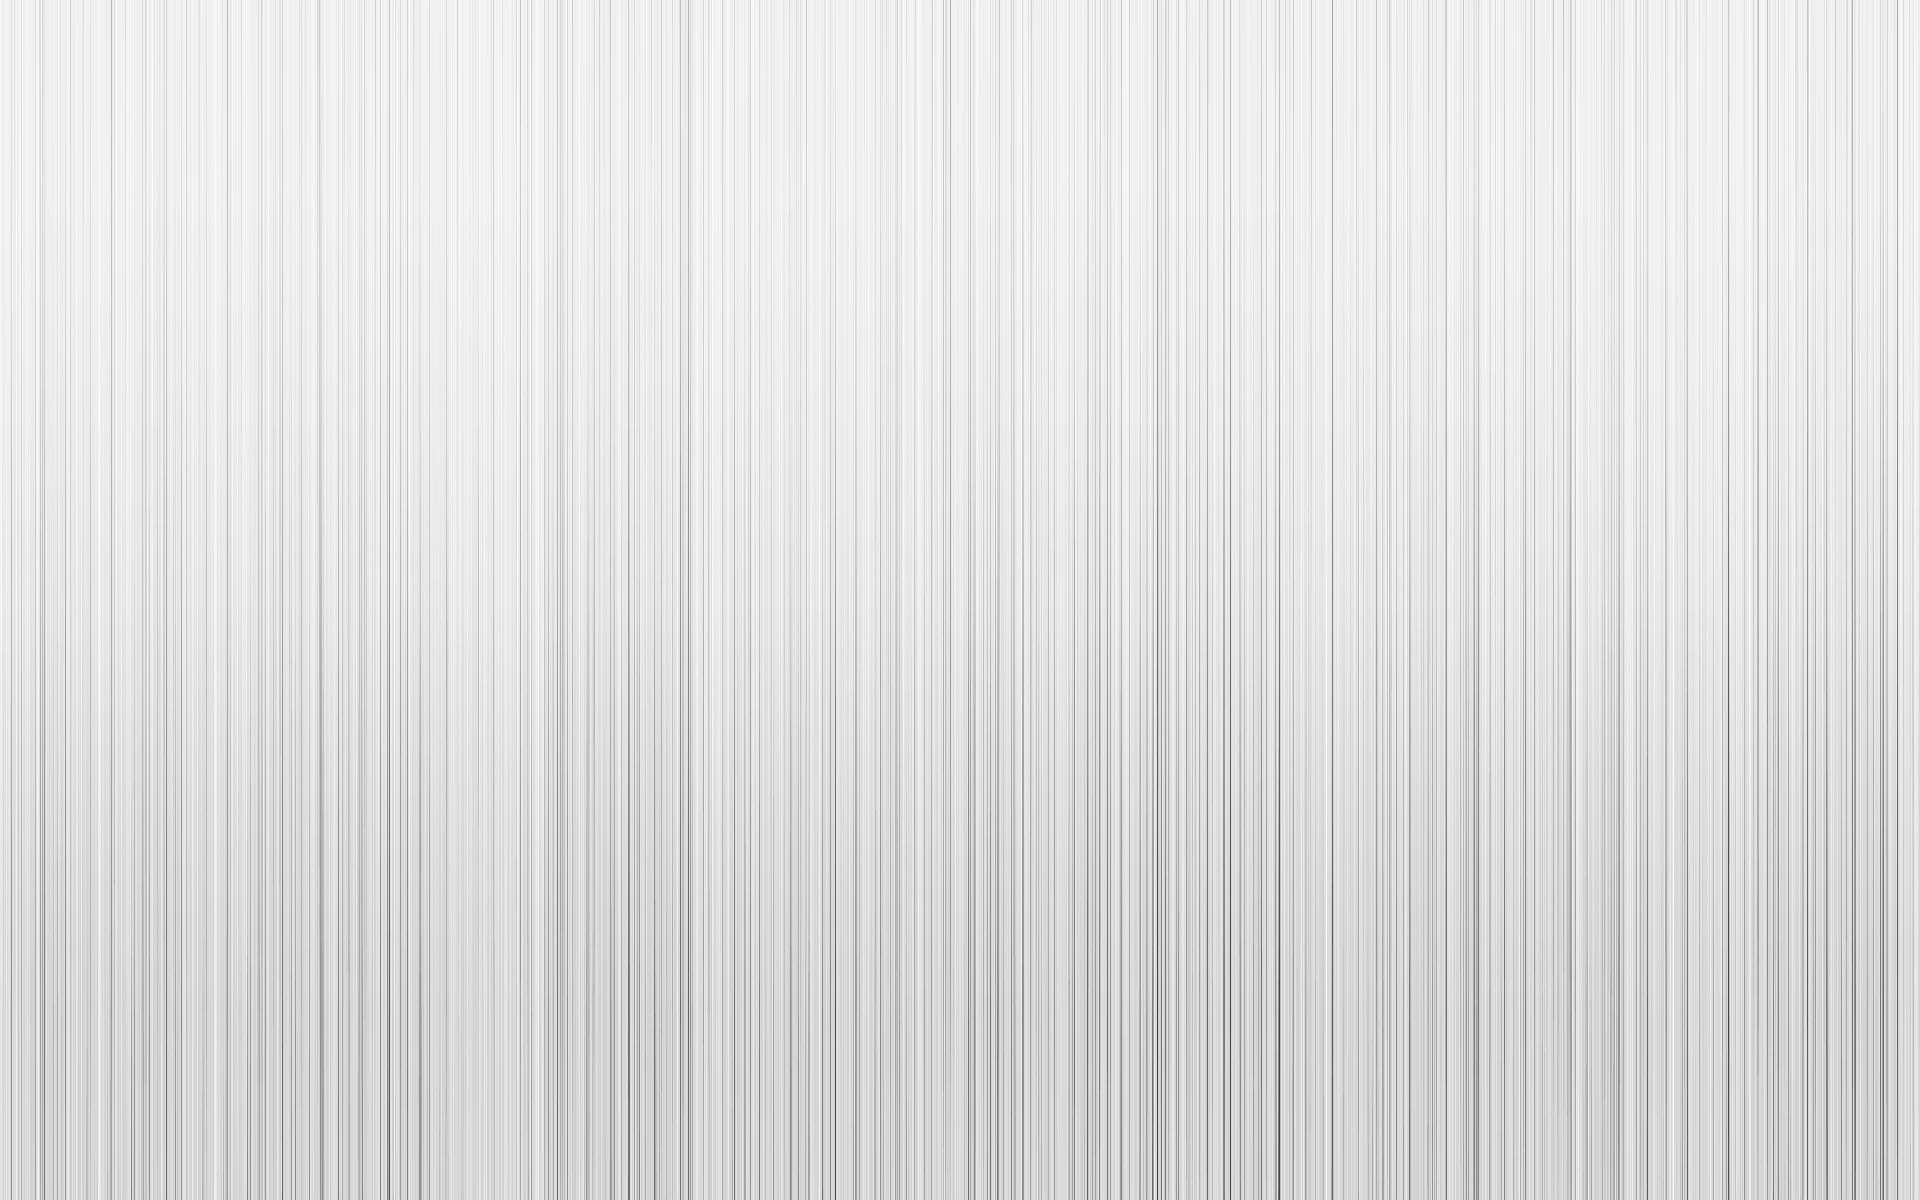 Fall Dog Wallpaper Grey Wallpaper Hd Download Free Grey Background 4season